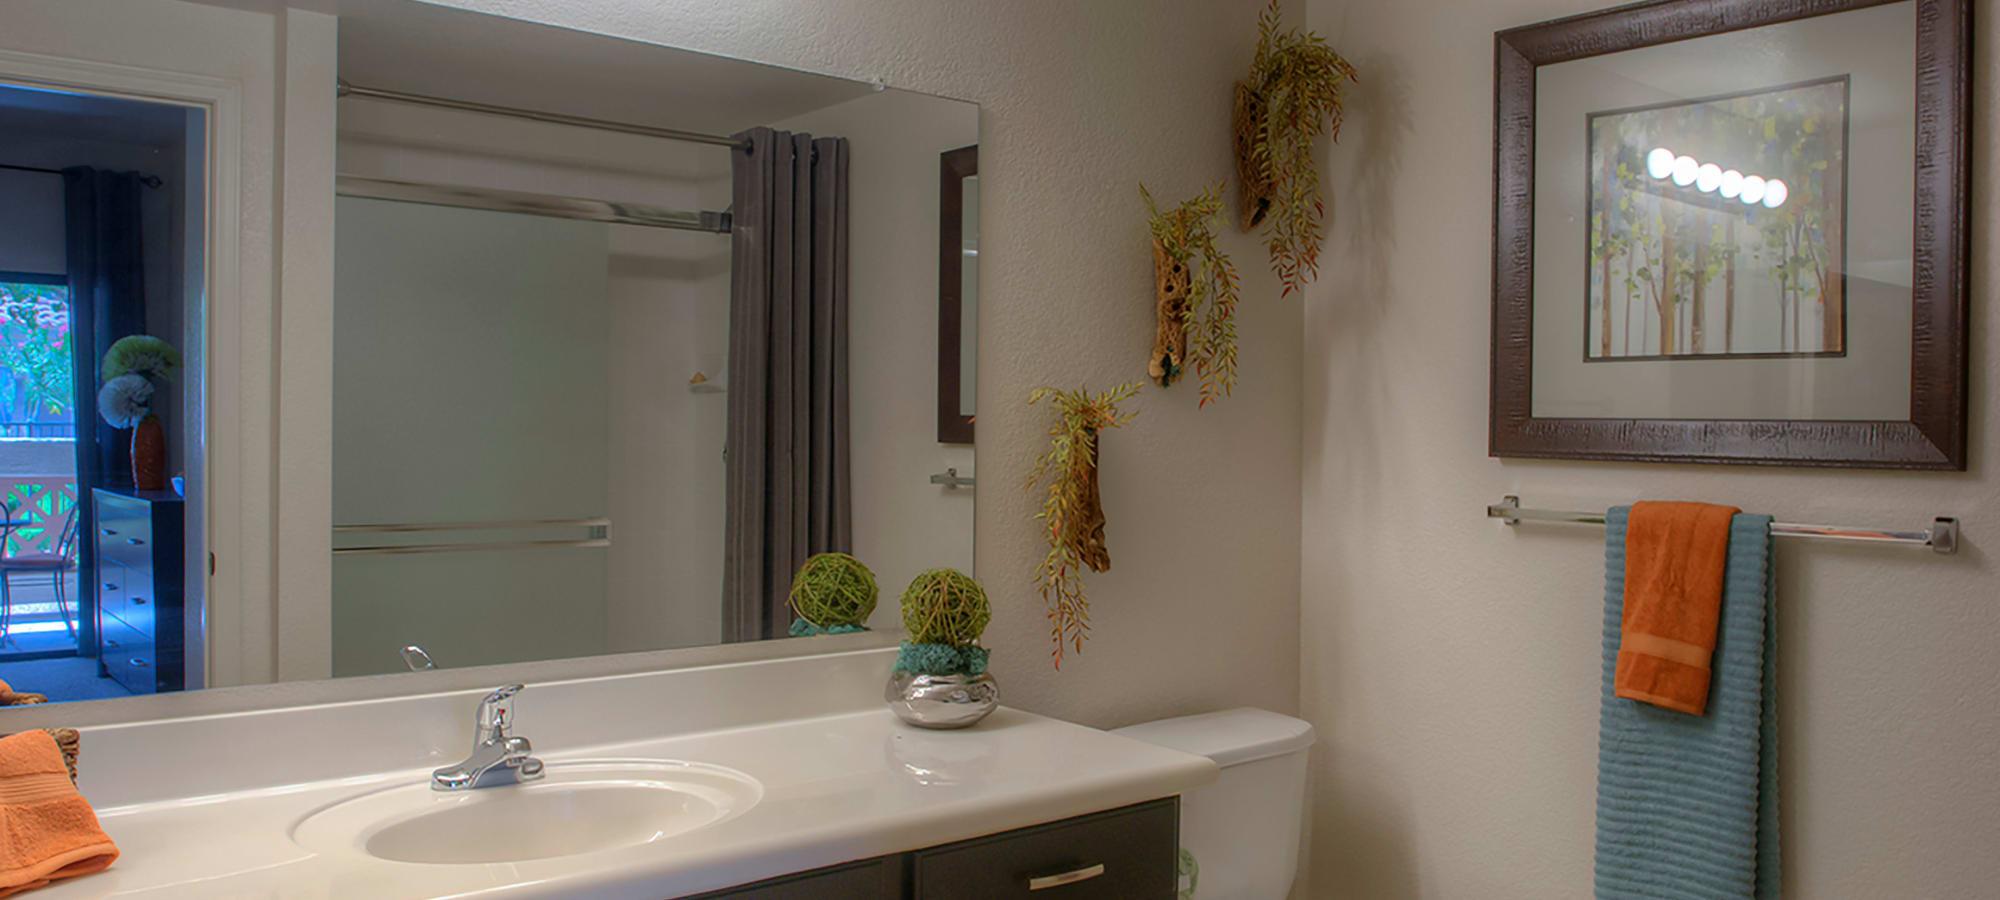 Large vanity mirror and granite countertop in a model home's bathroom at San Pedregal in Phoenix, Arizona